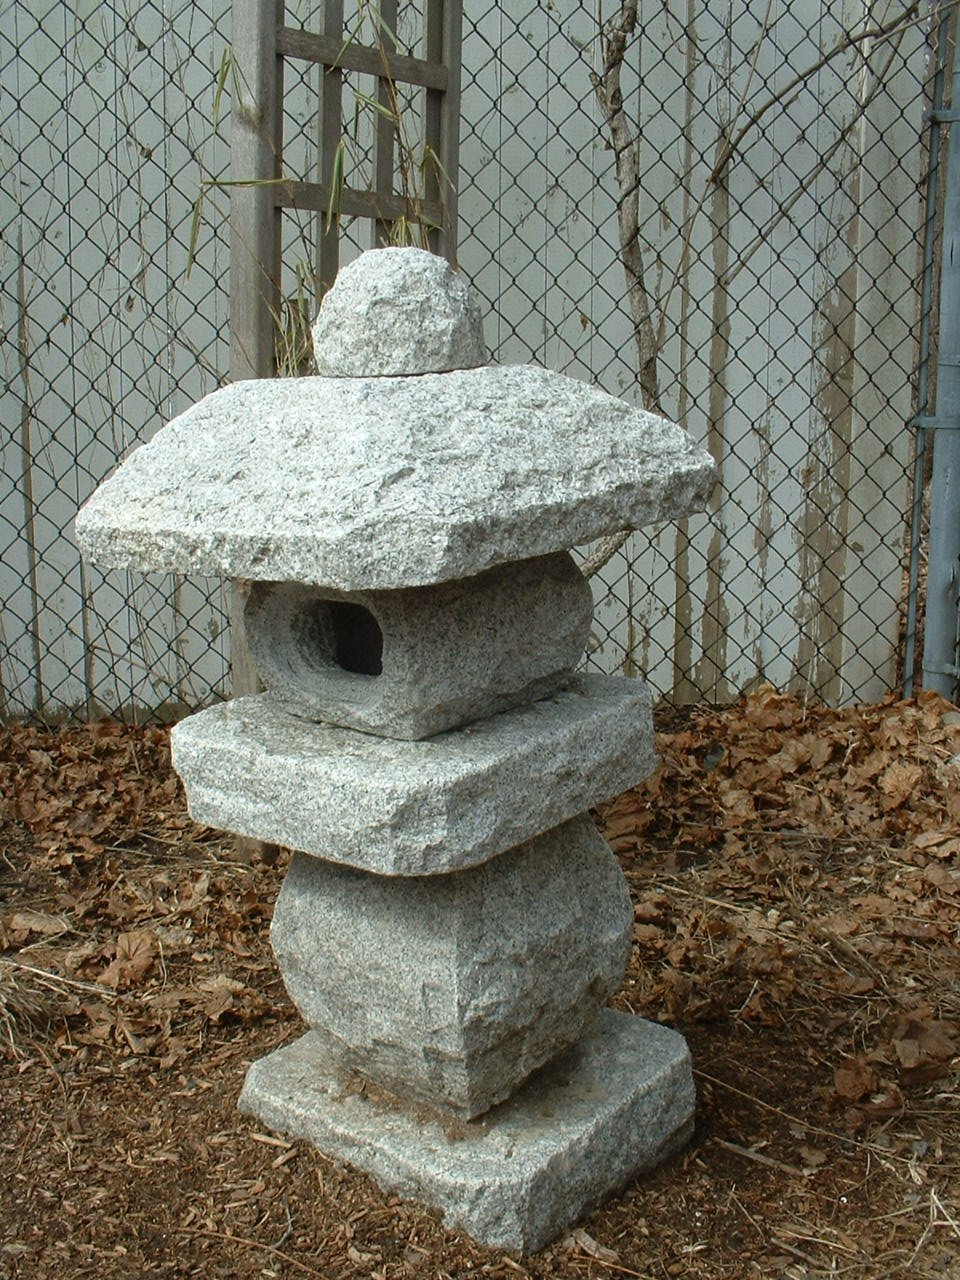 Japanese garden stone lantern | Reading, MA Patch